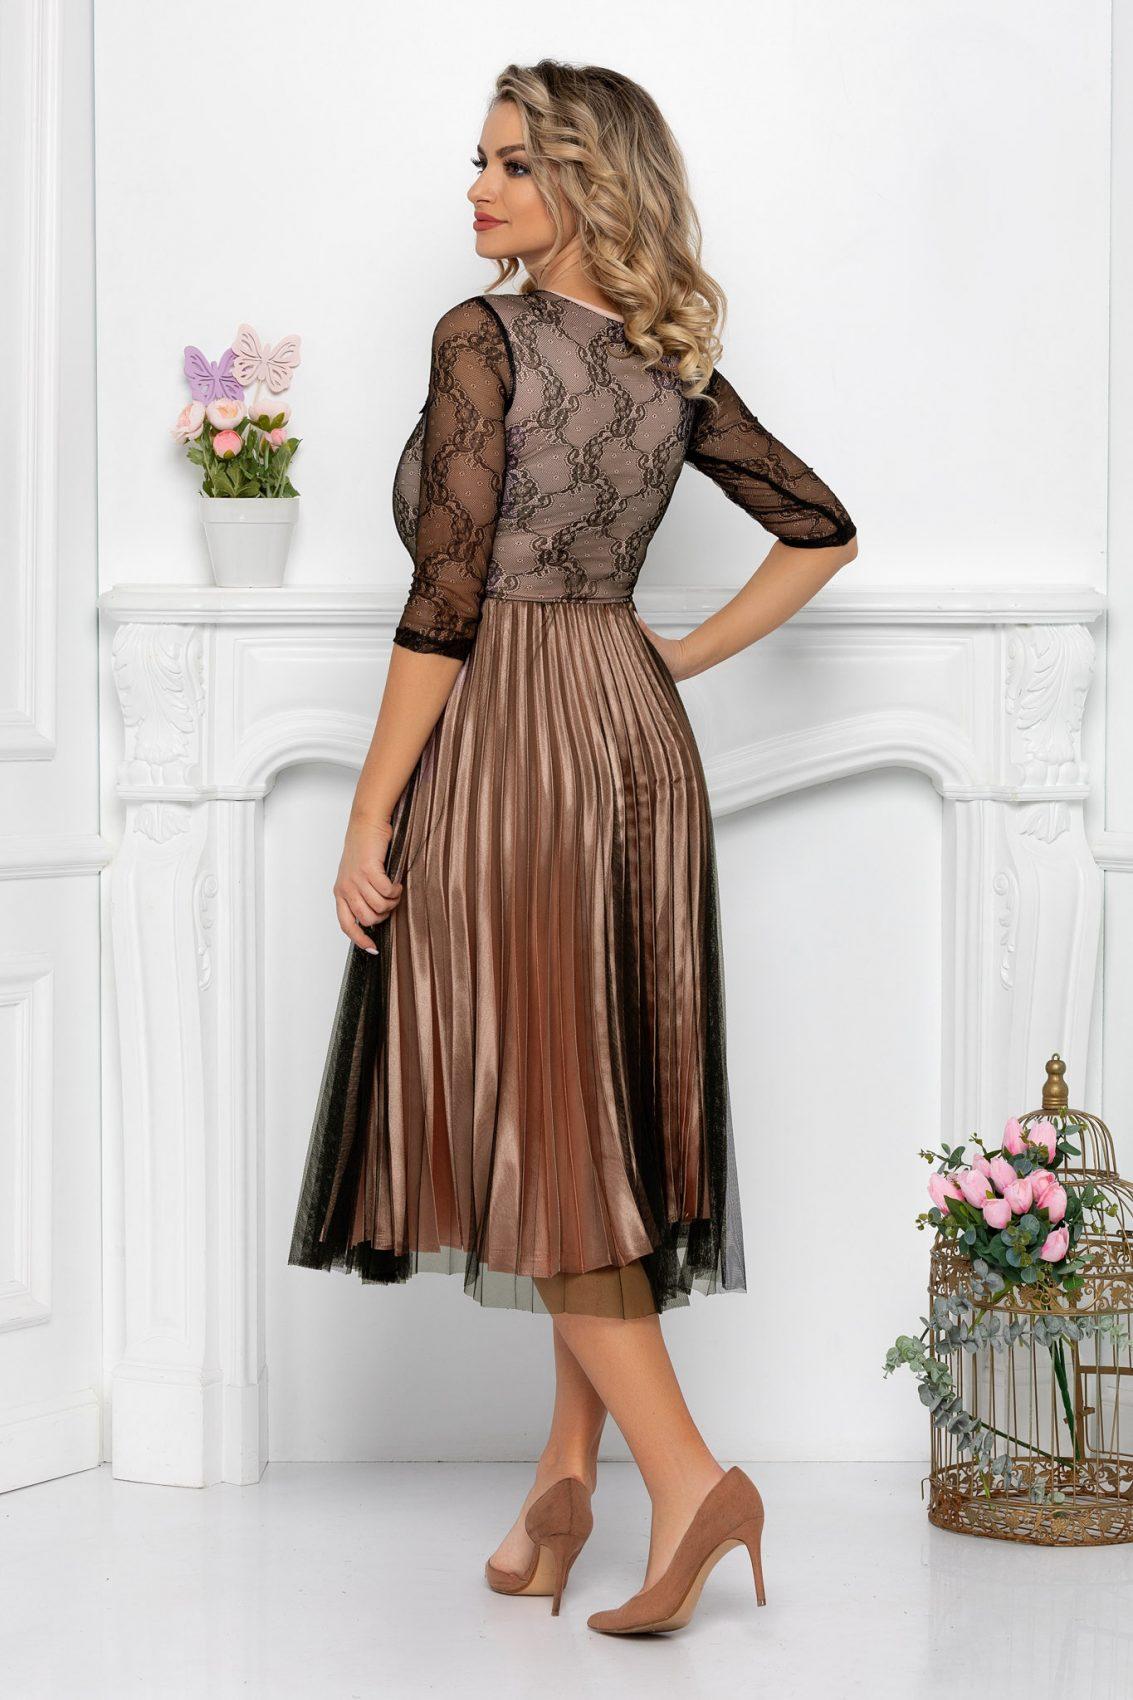 Nude Μίντι Πλισέ Φόρεμα Romance 9490 2